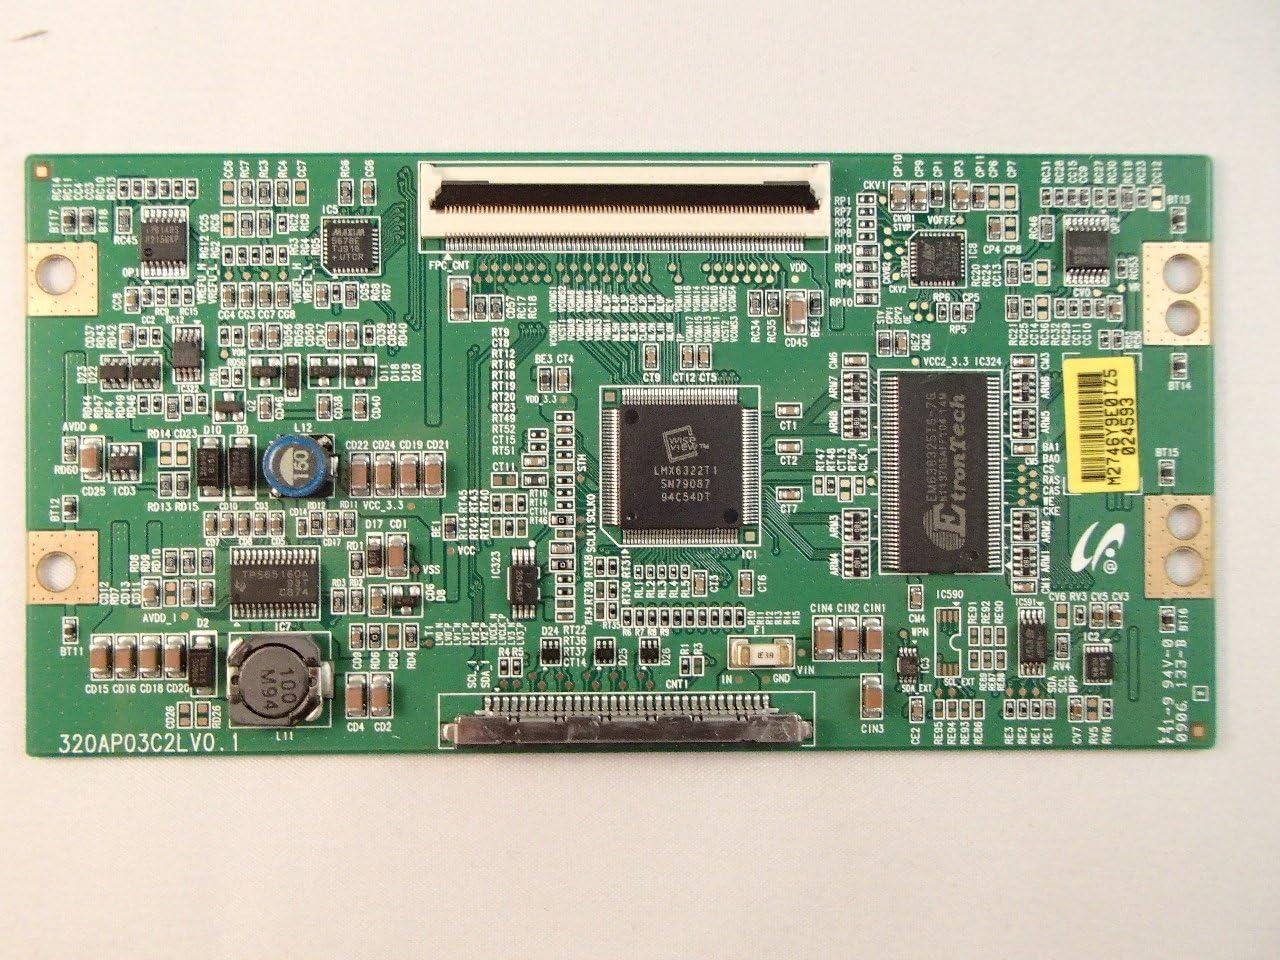 32 32AV502R 32AV52R 32C100U1 LJ94-02746Y T-Con LCD Timing Control Board